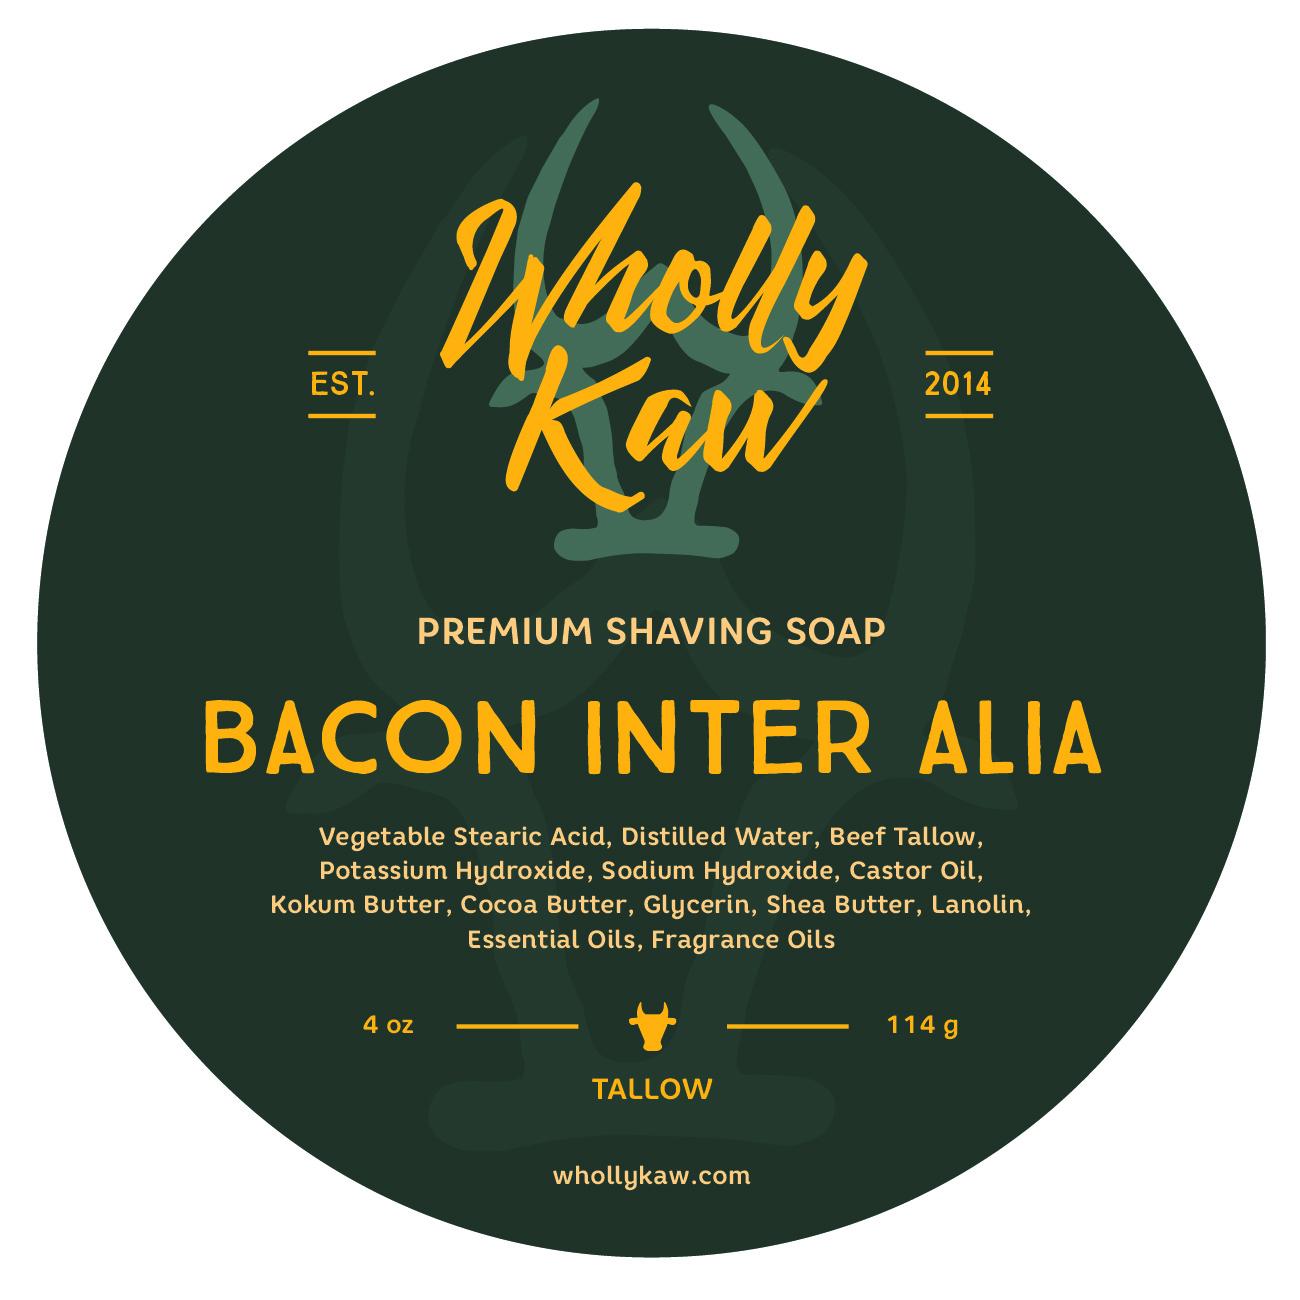 Wholly Kaw - Bacon Inter Alia - Soap image